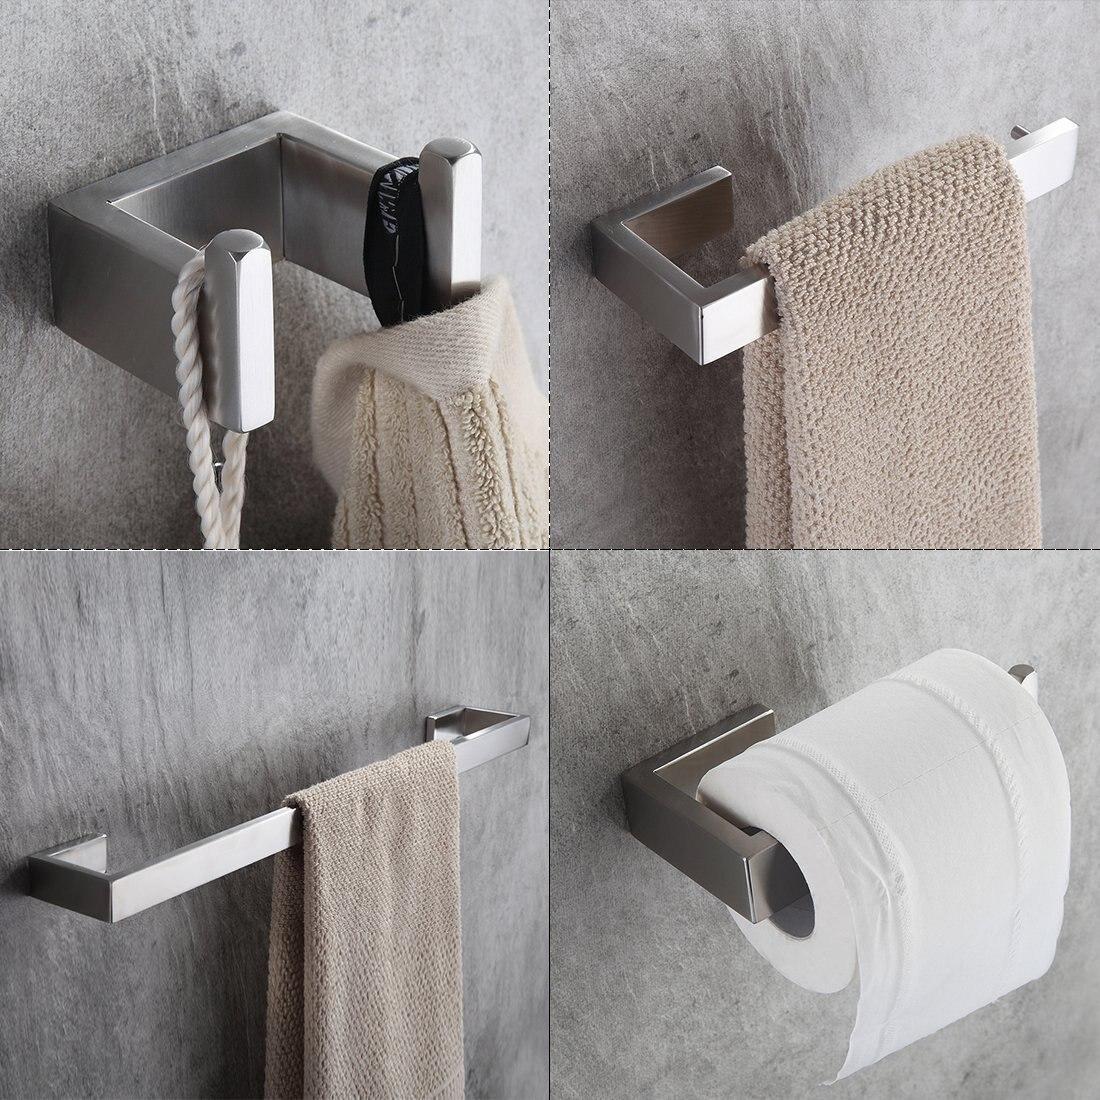 4 Piece/set Bath Hardware Sets 304 Stainless Steel Bathroom Accessories Set Single Towel ...